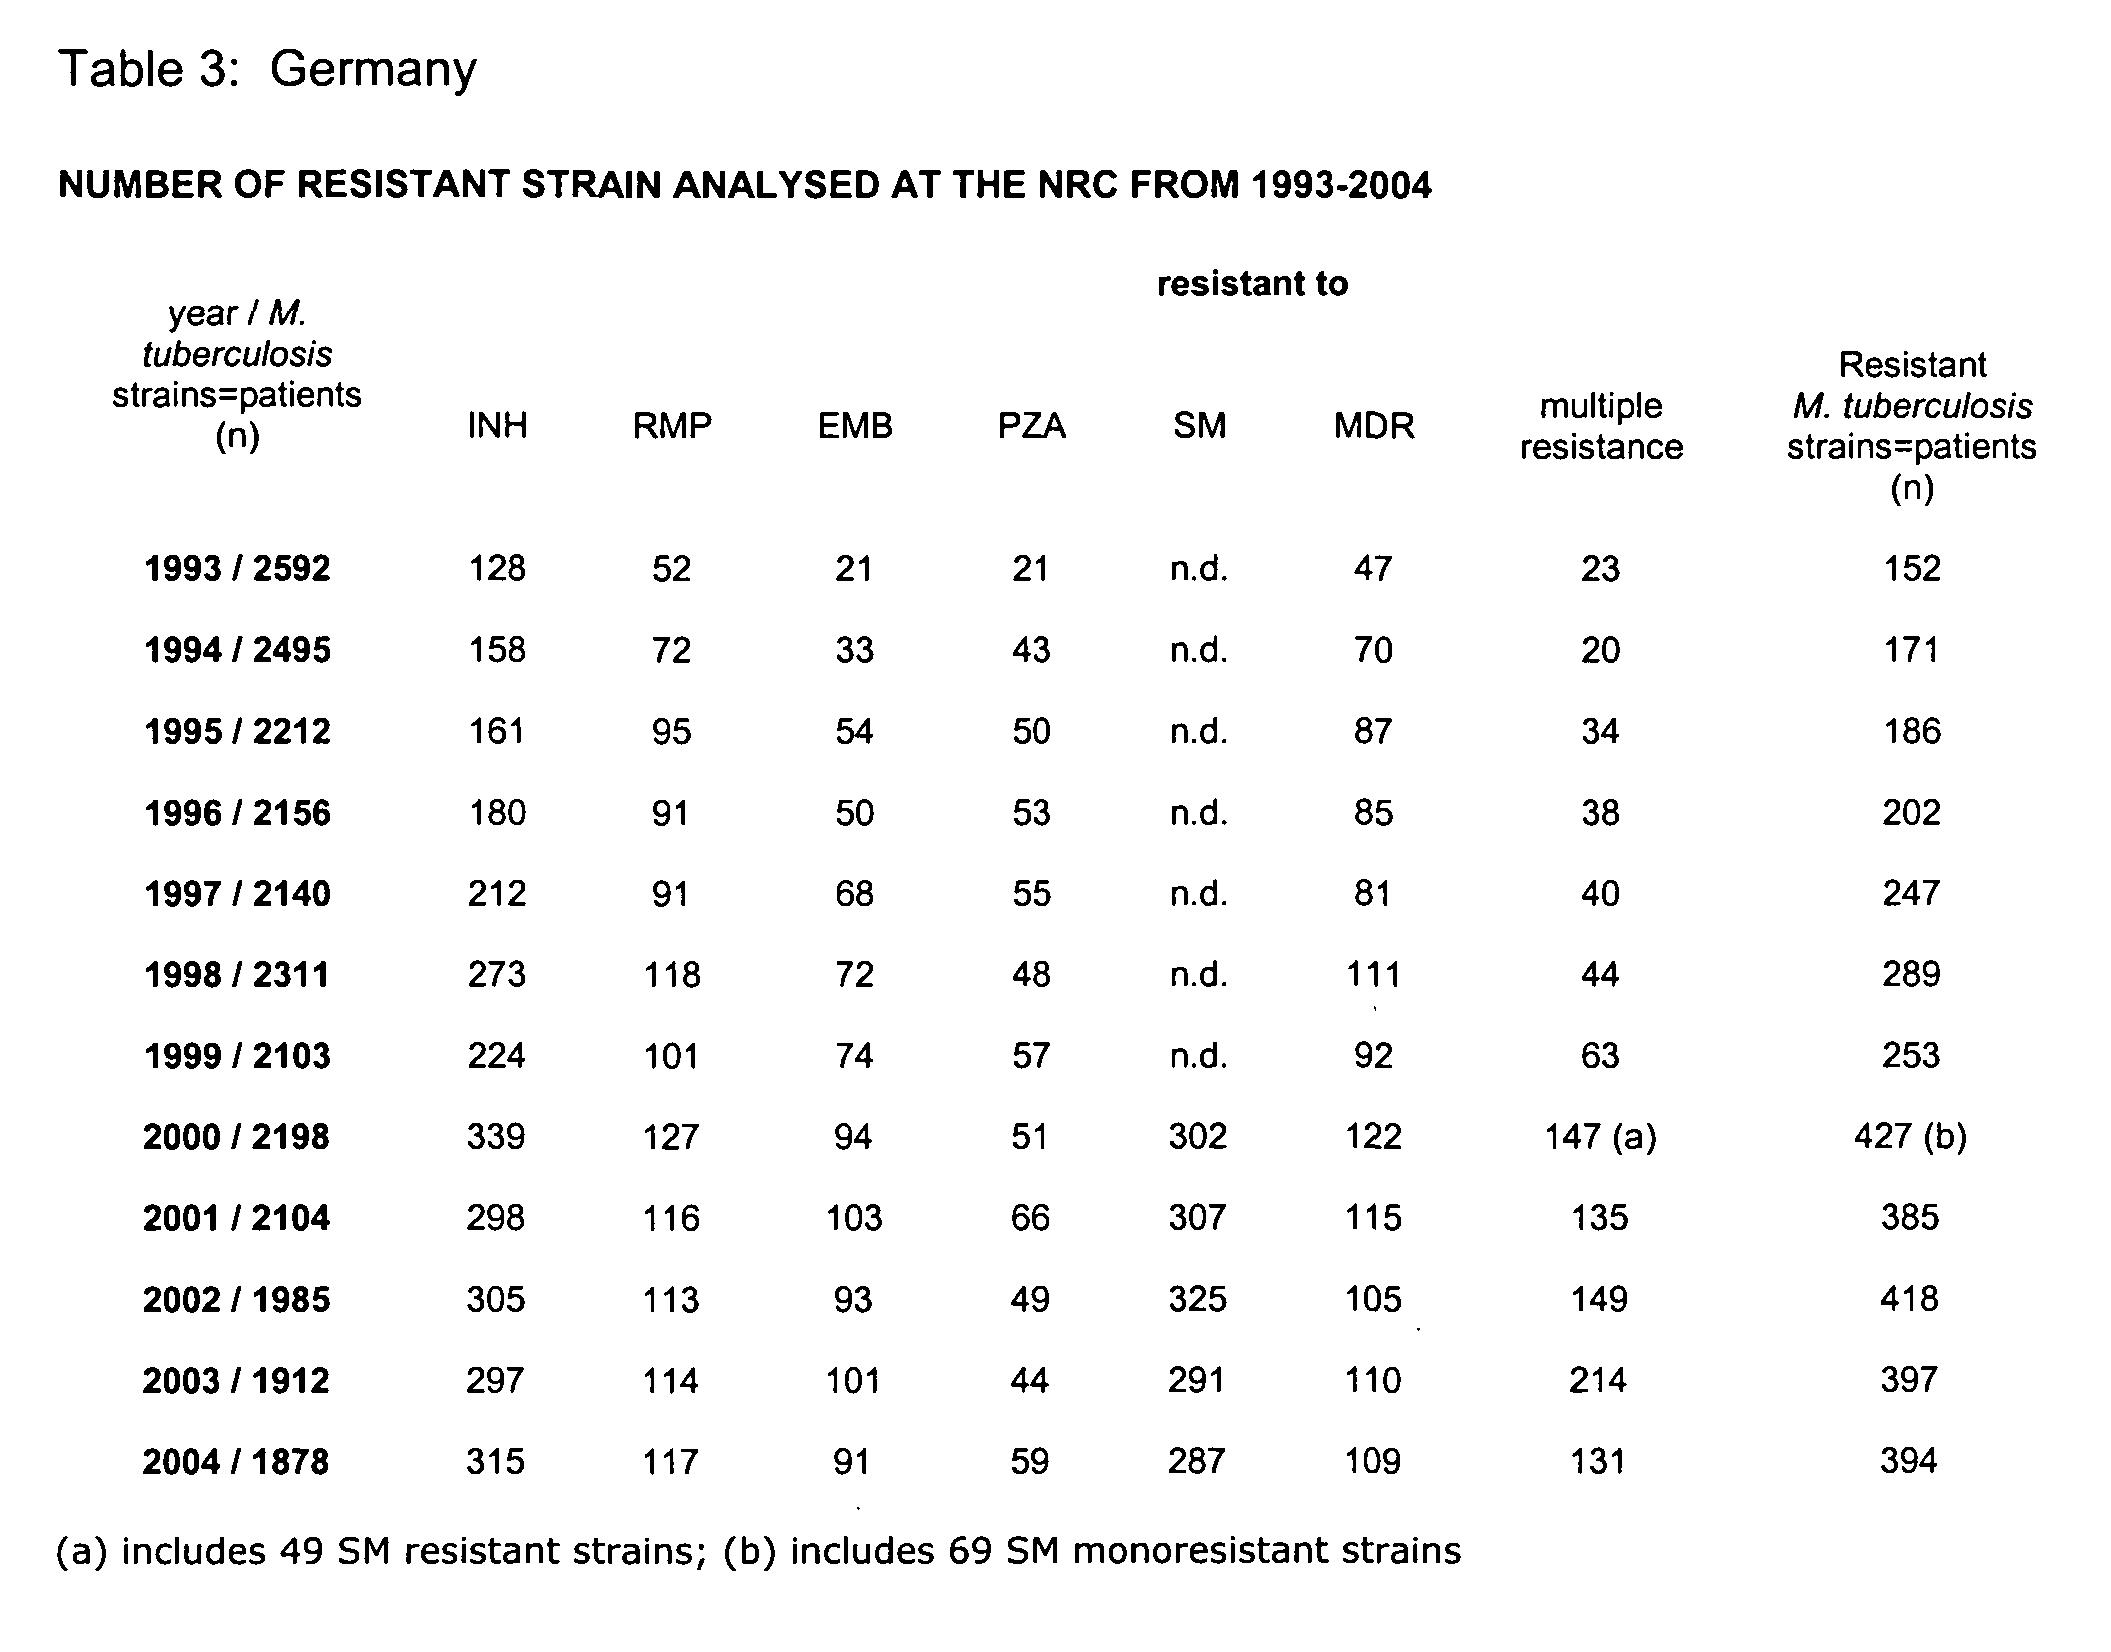 Multiplication Chart 300 Figure imgf000013_0001